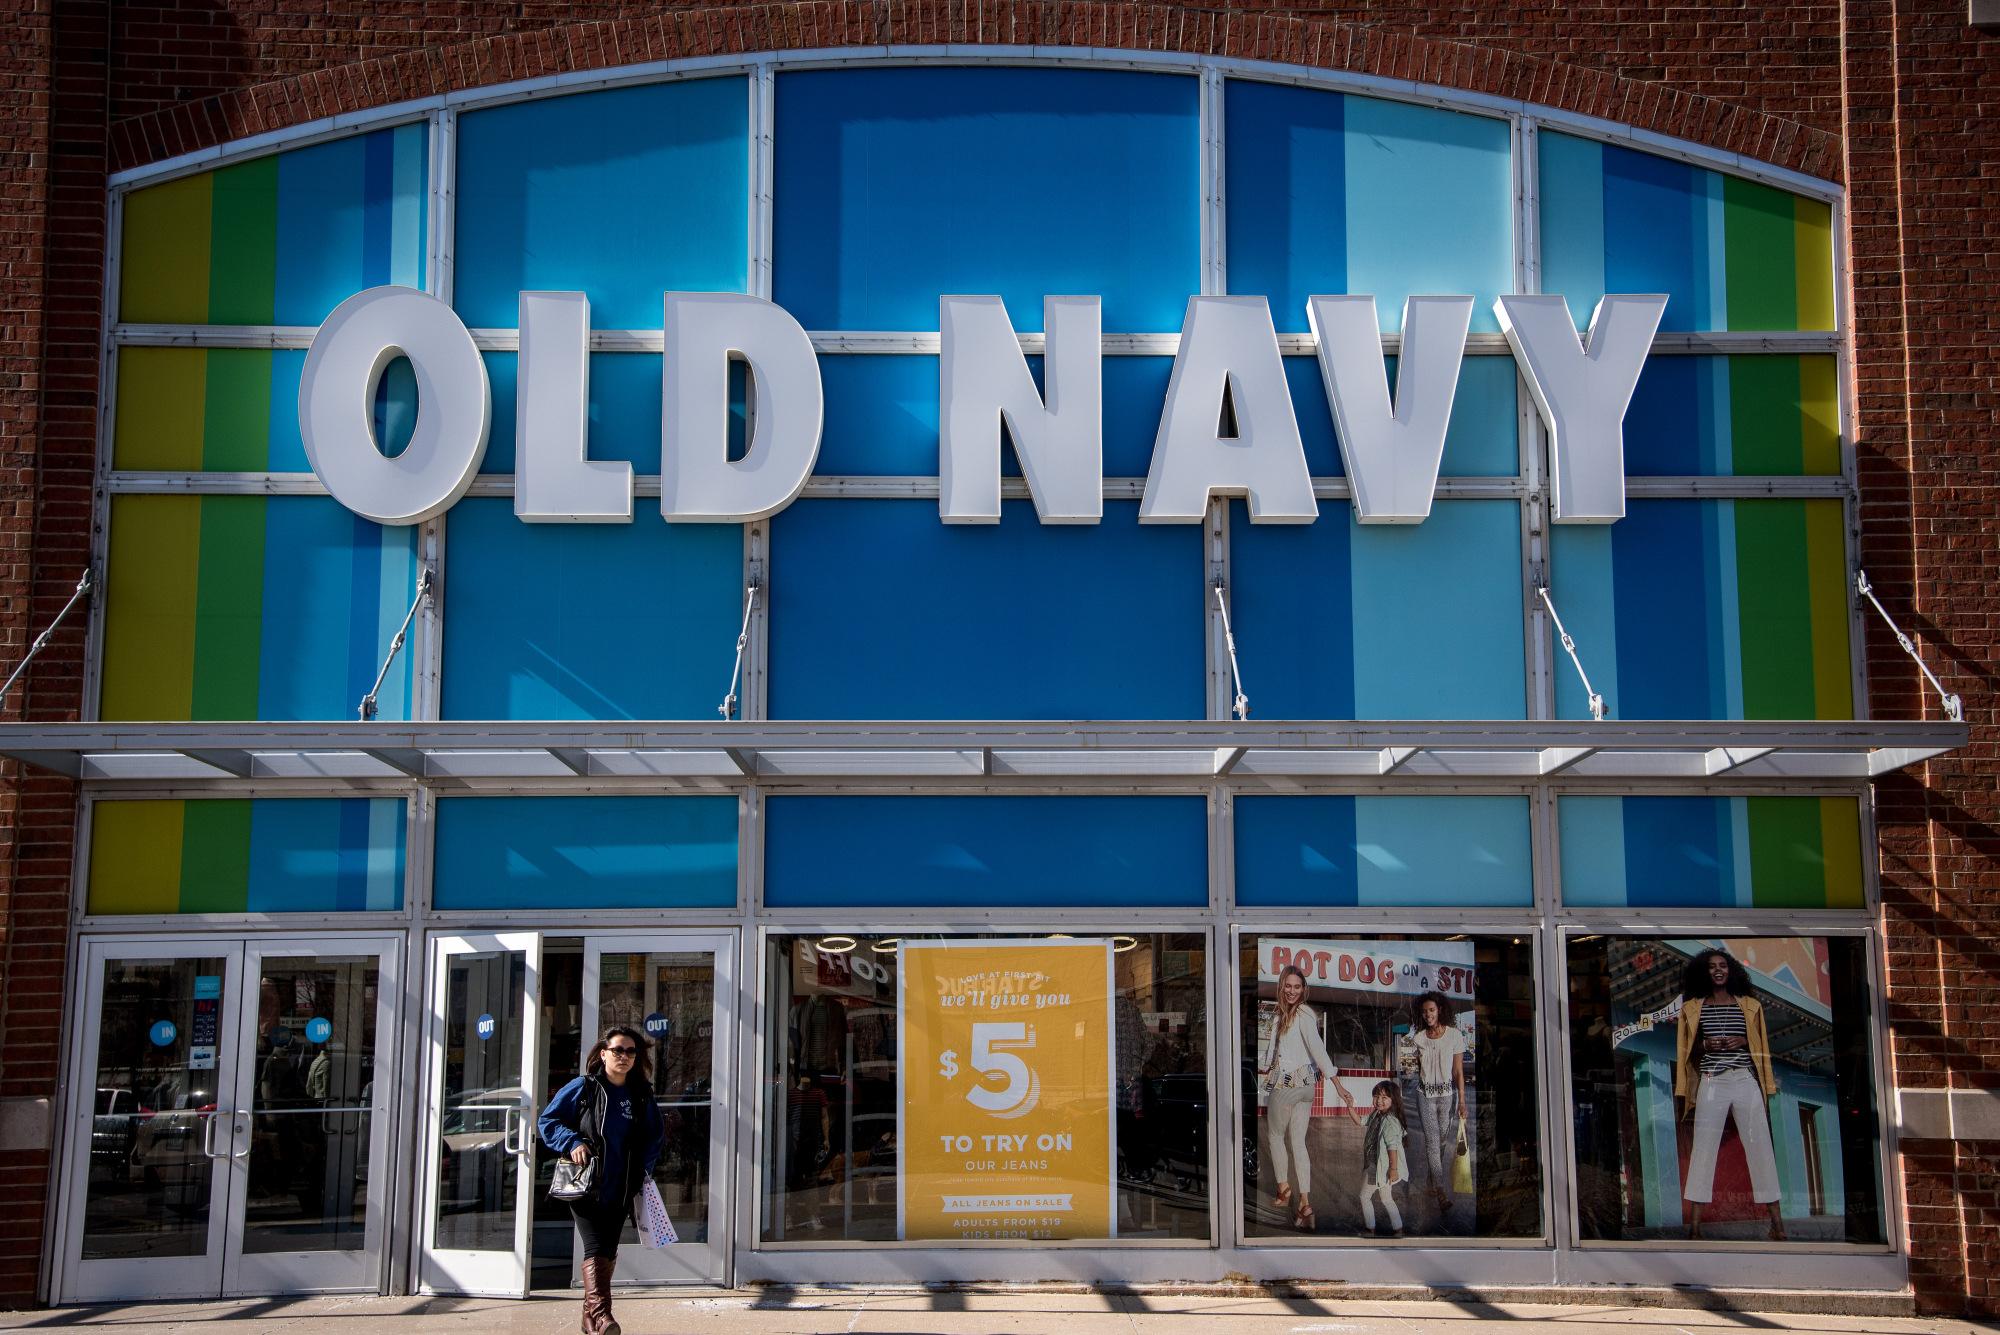 Gap\'s Old Navy Chain Joins Gap Brand in Posting Key Sales Miss ...